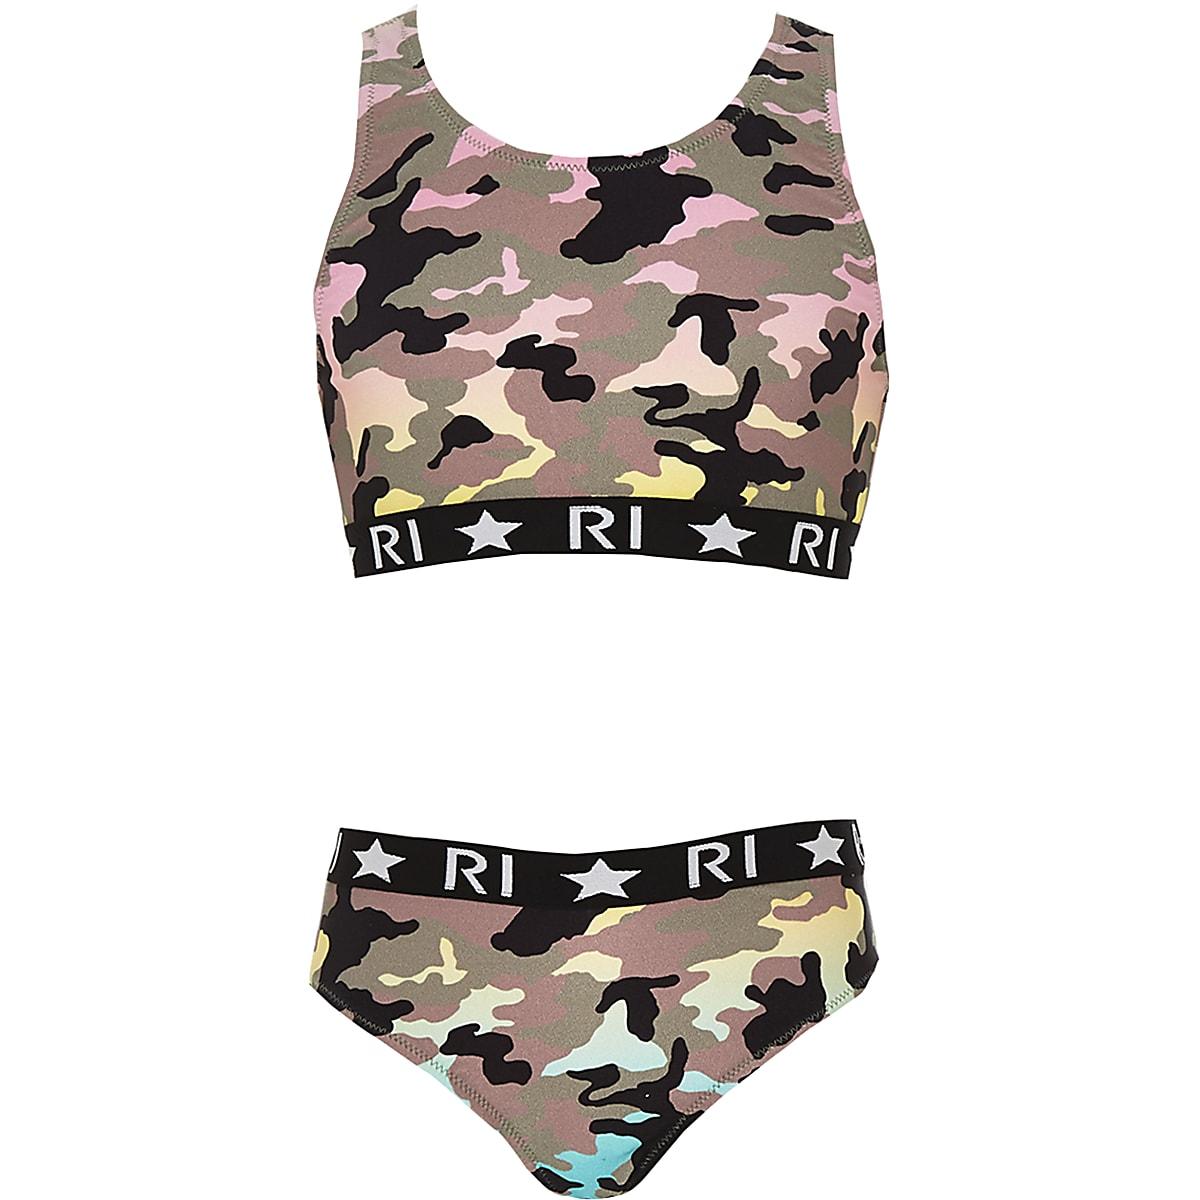 a39c46376f452 Girls khaki camo print RI bikini set - Bikinis - Swimwear & Beachwear -  girls